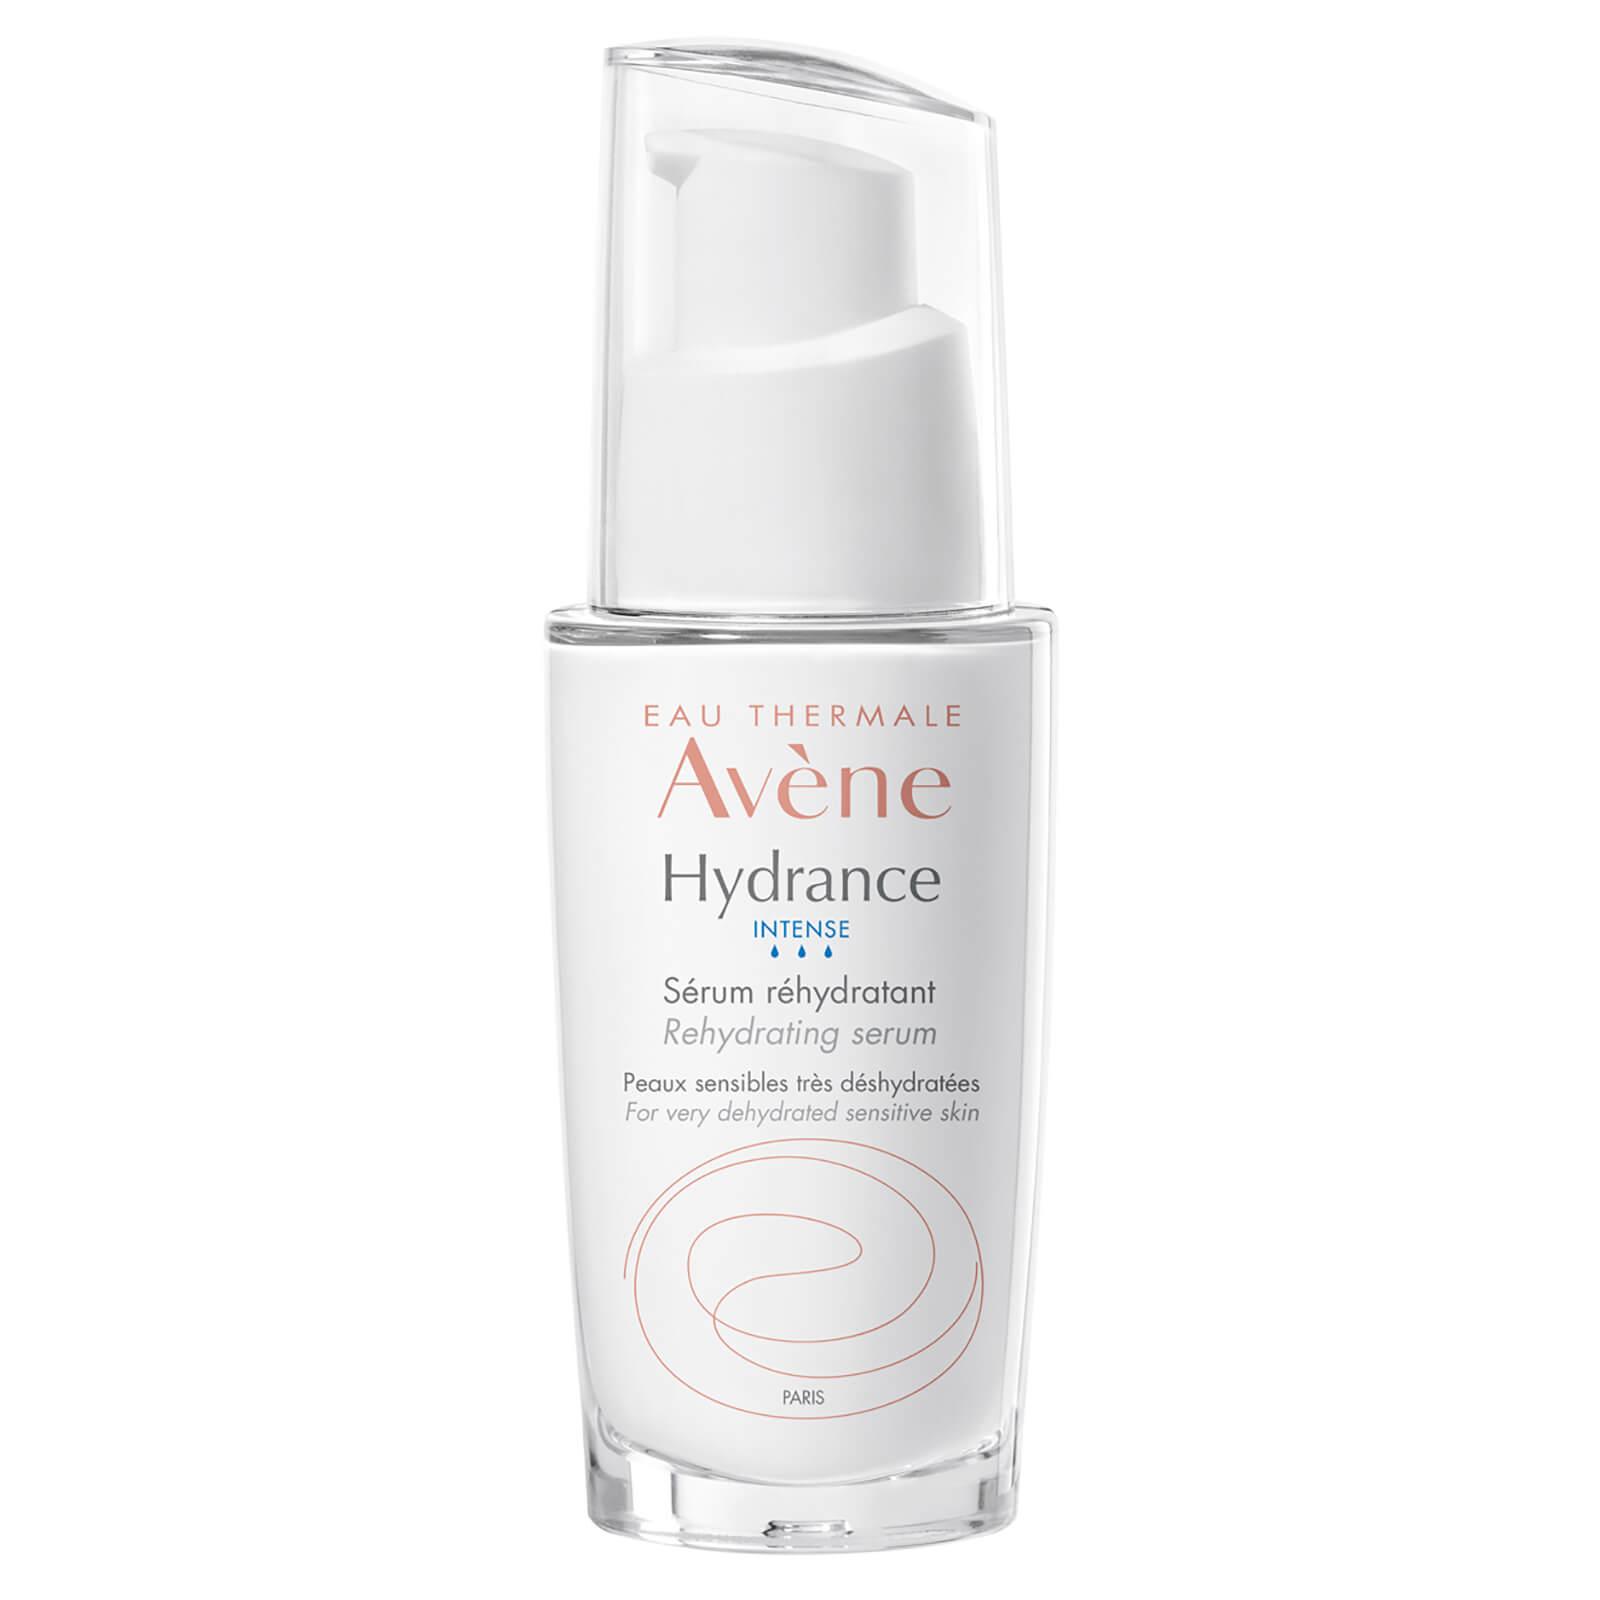 Avene Hydrance Intense Serum